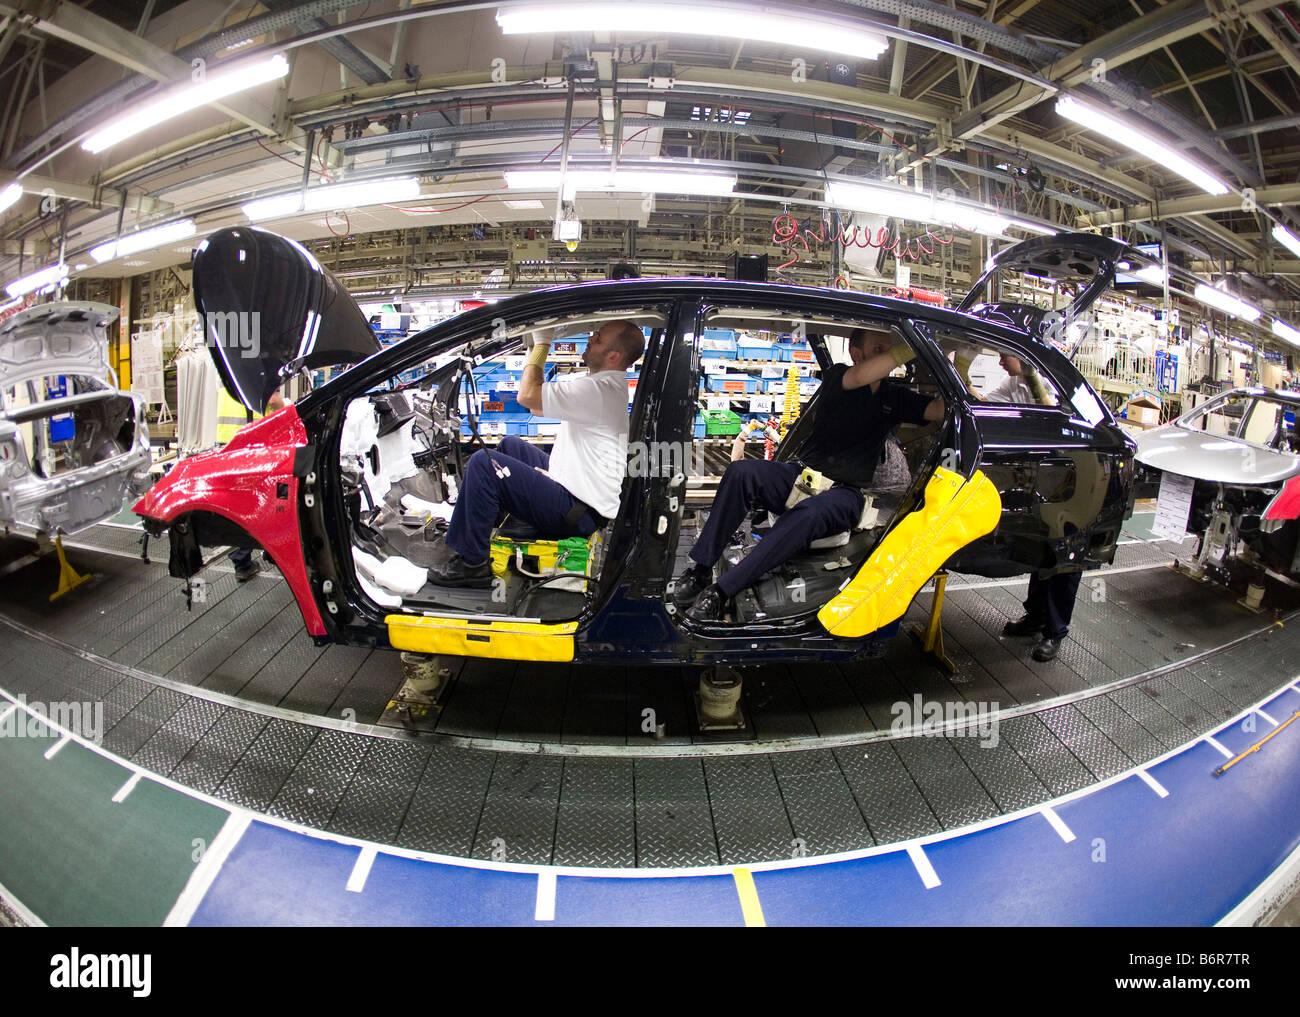 Car Stockpile Stockfotos & Car Stockpile Bilder - Seite 3 - Alamy